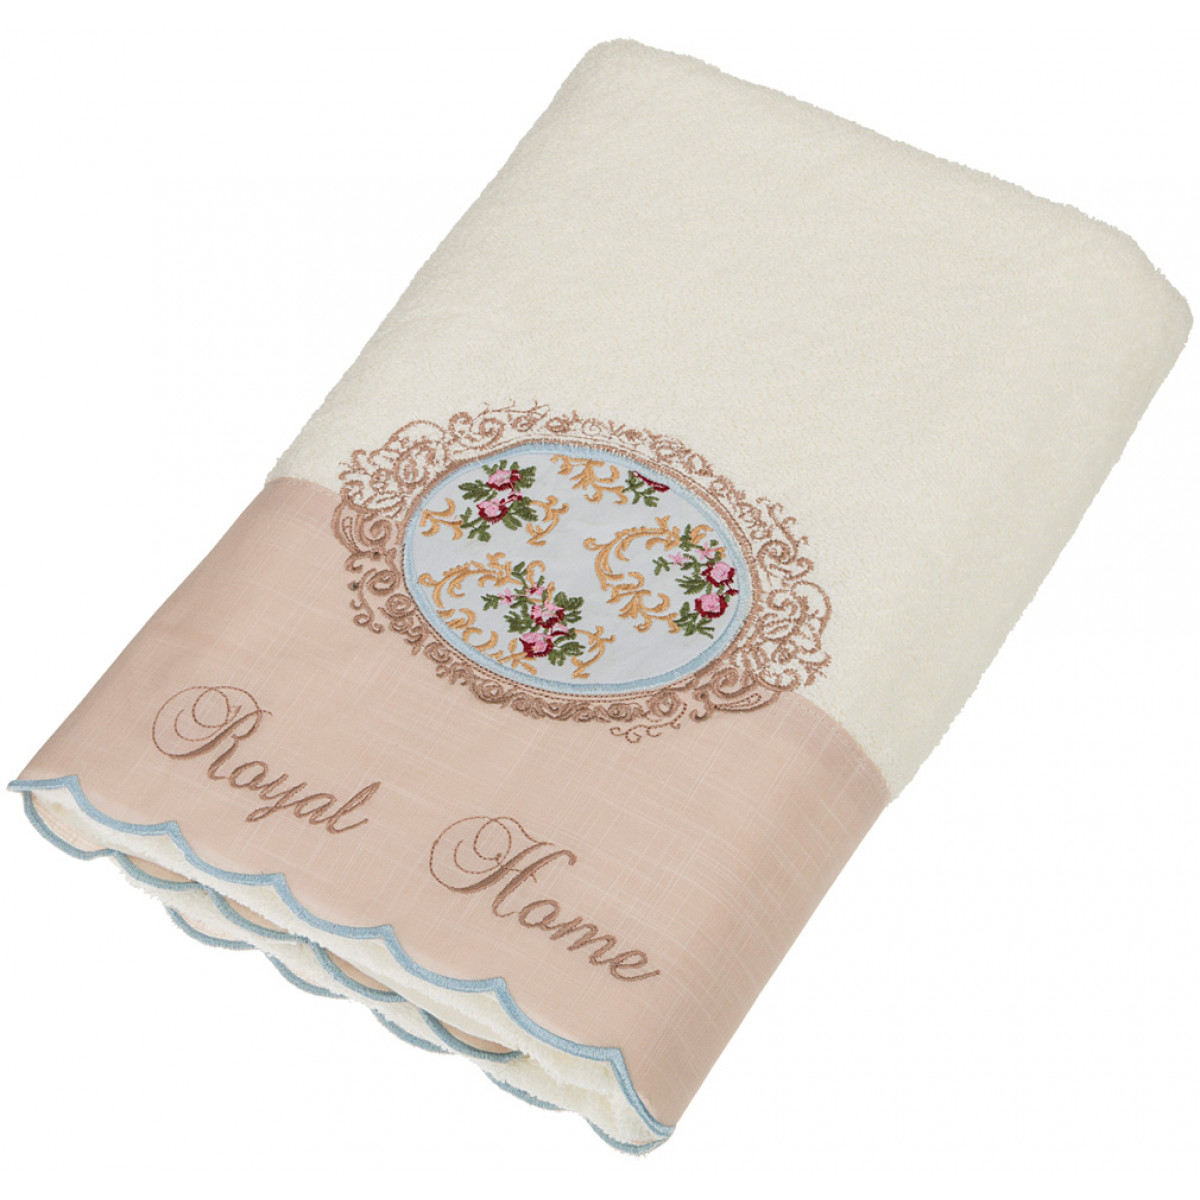 Полотенца Santalino Полотенце Abigall(70х140 см) полотенца tango полотенце stevania 70х140 см